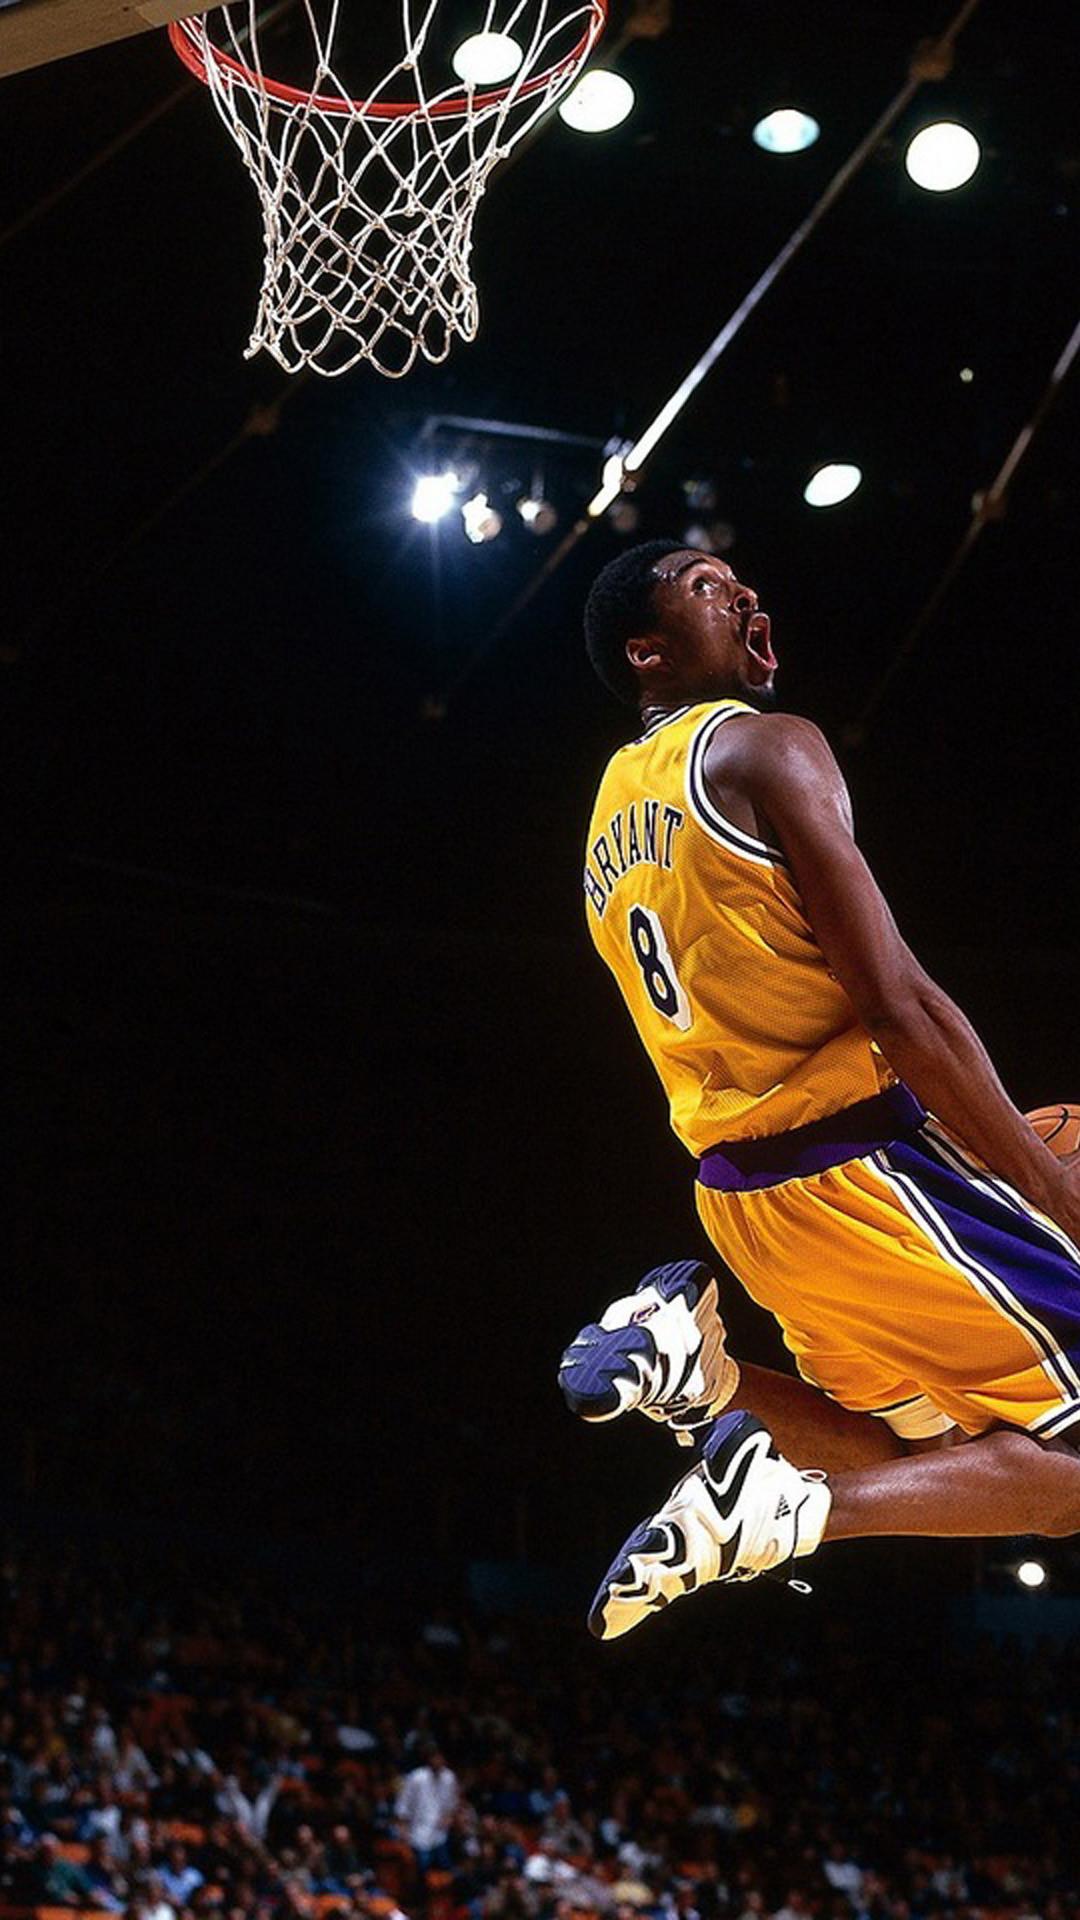 Kobe Bryant Screensaver : bryant, screensaver, Bryant, IPhone, Wallpapers, Wallpaper